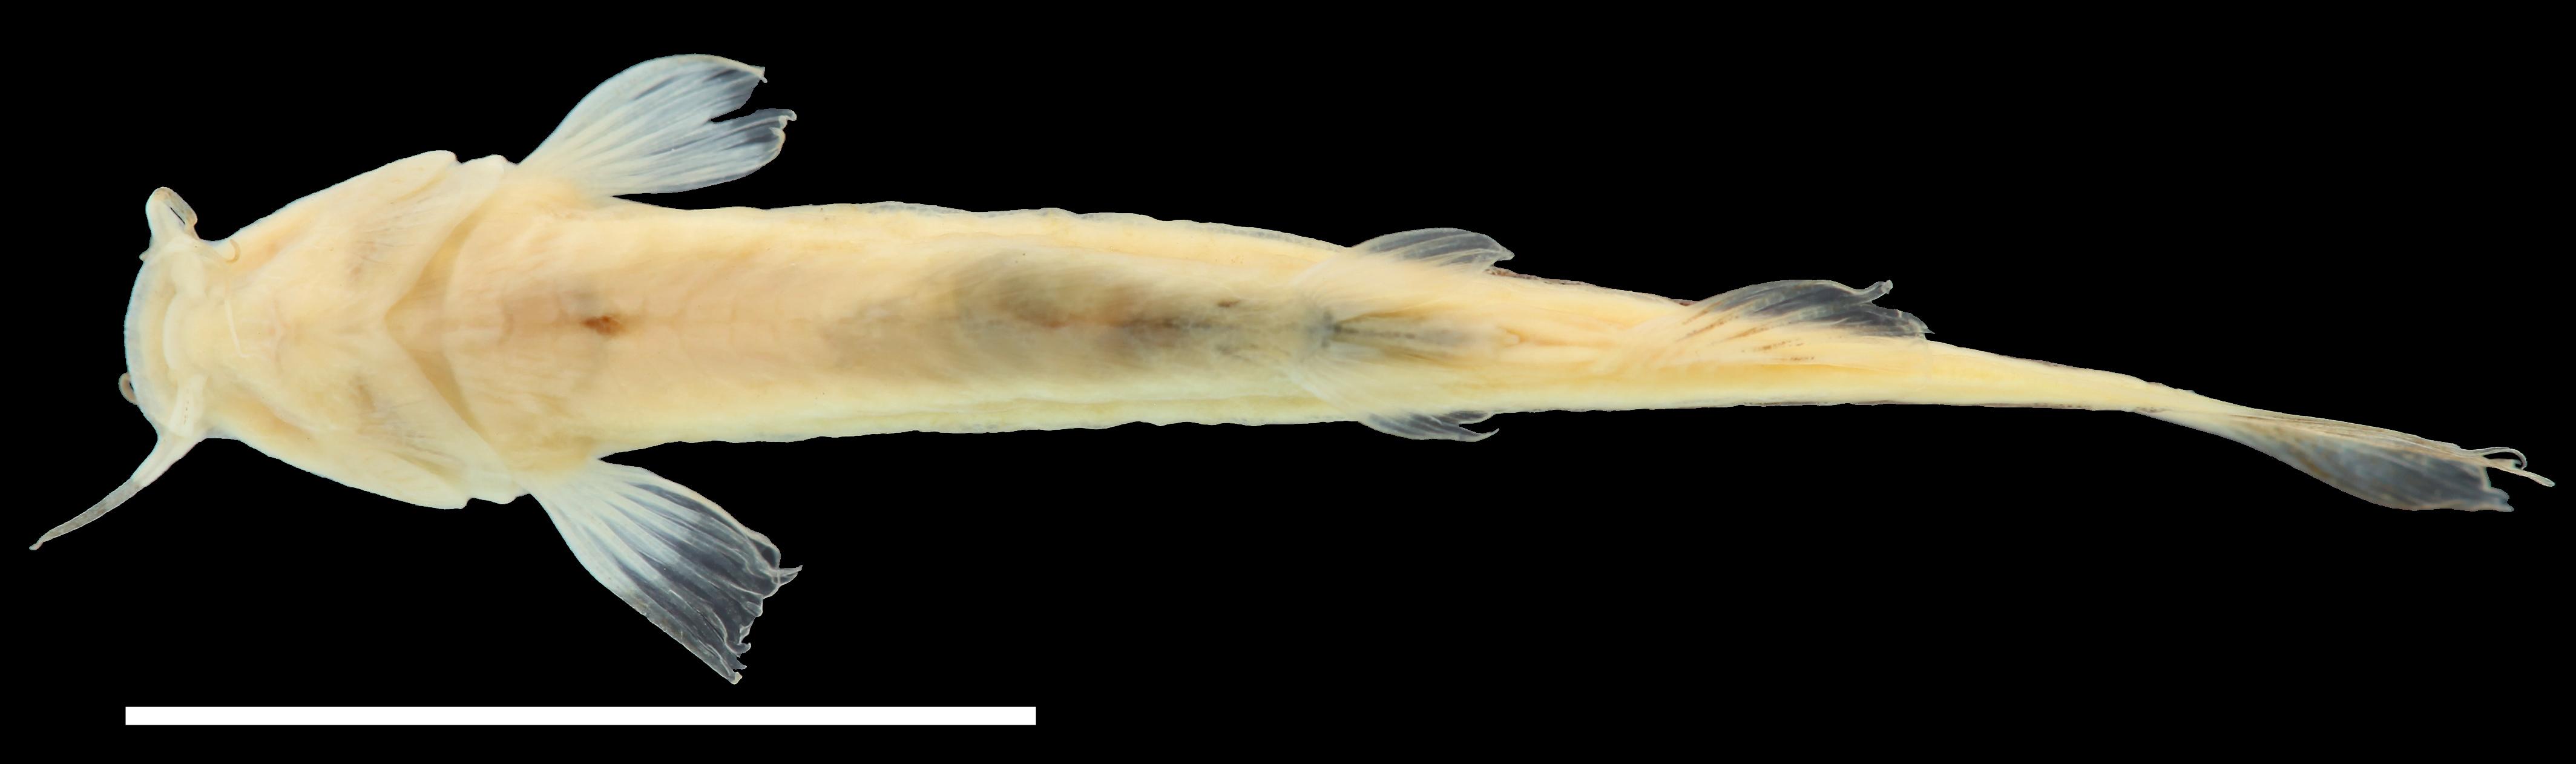 Paratípo de <em>Trichomycterus maldonadoi</em>, IAvH-P-11533_Ventral, 22.7 mm SL (scale bar = 1 cm). Photograph by C. DoNascimiento